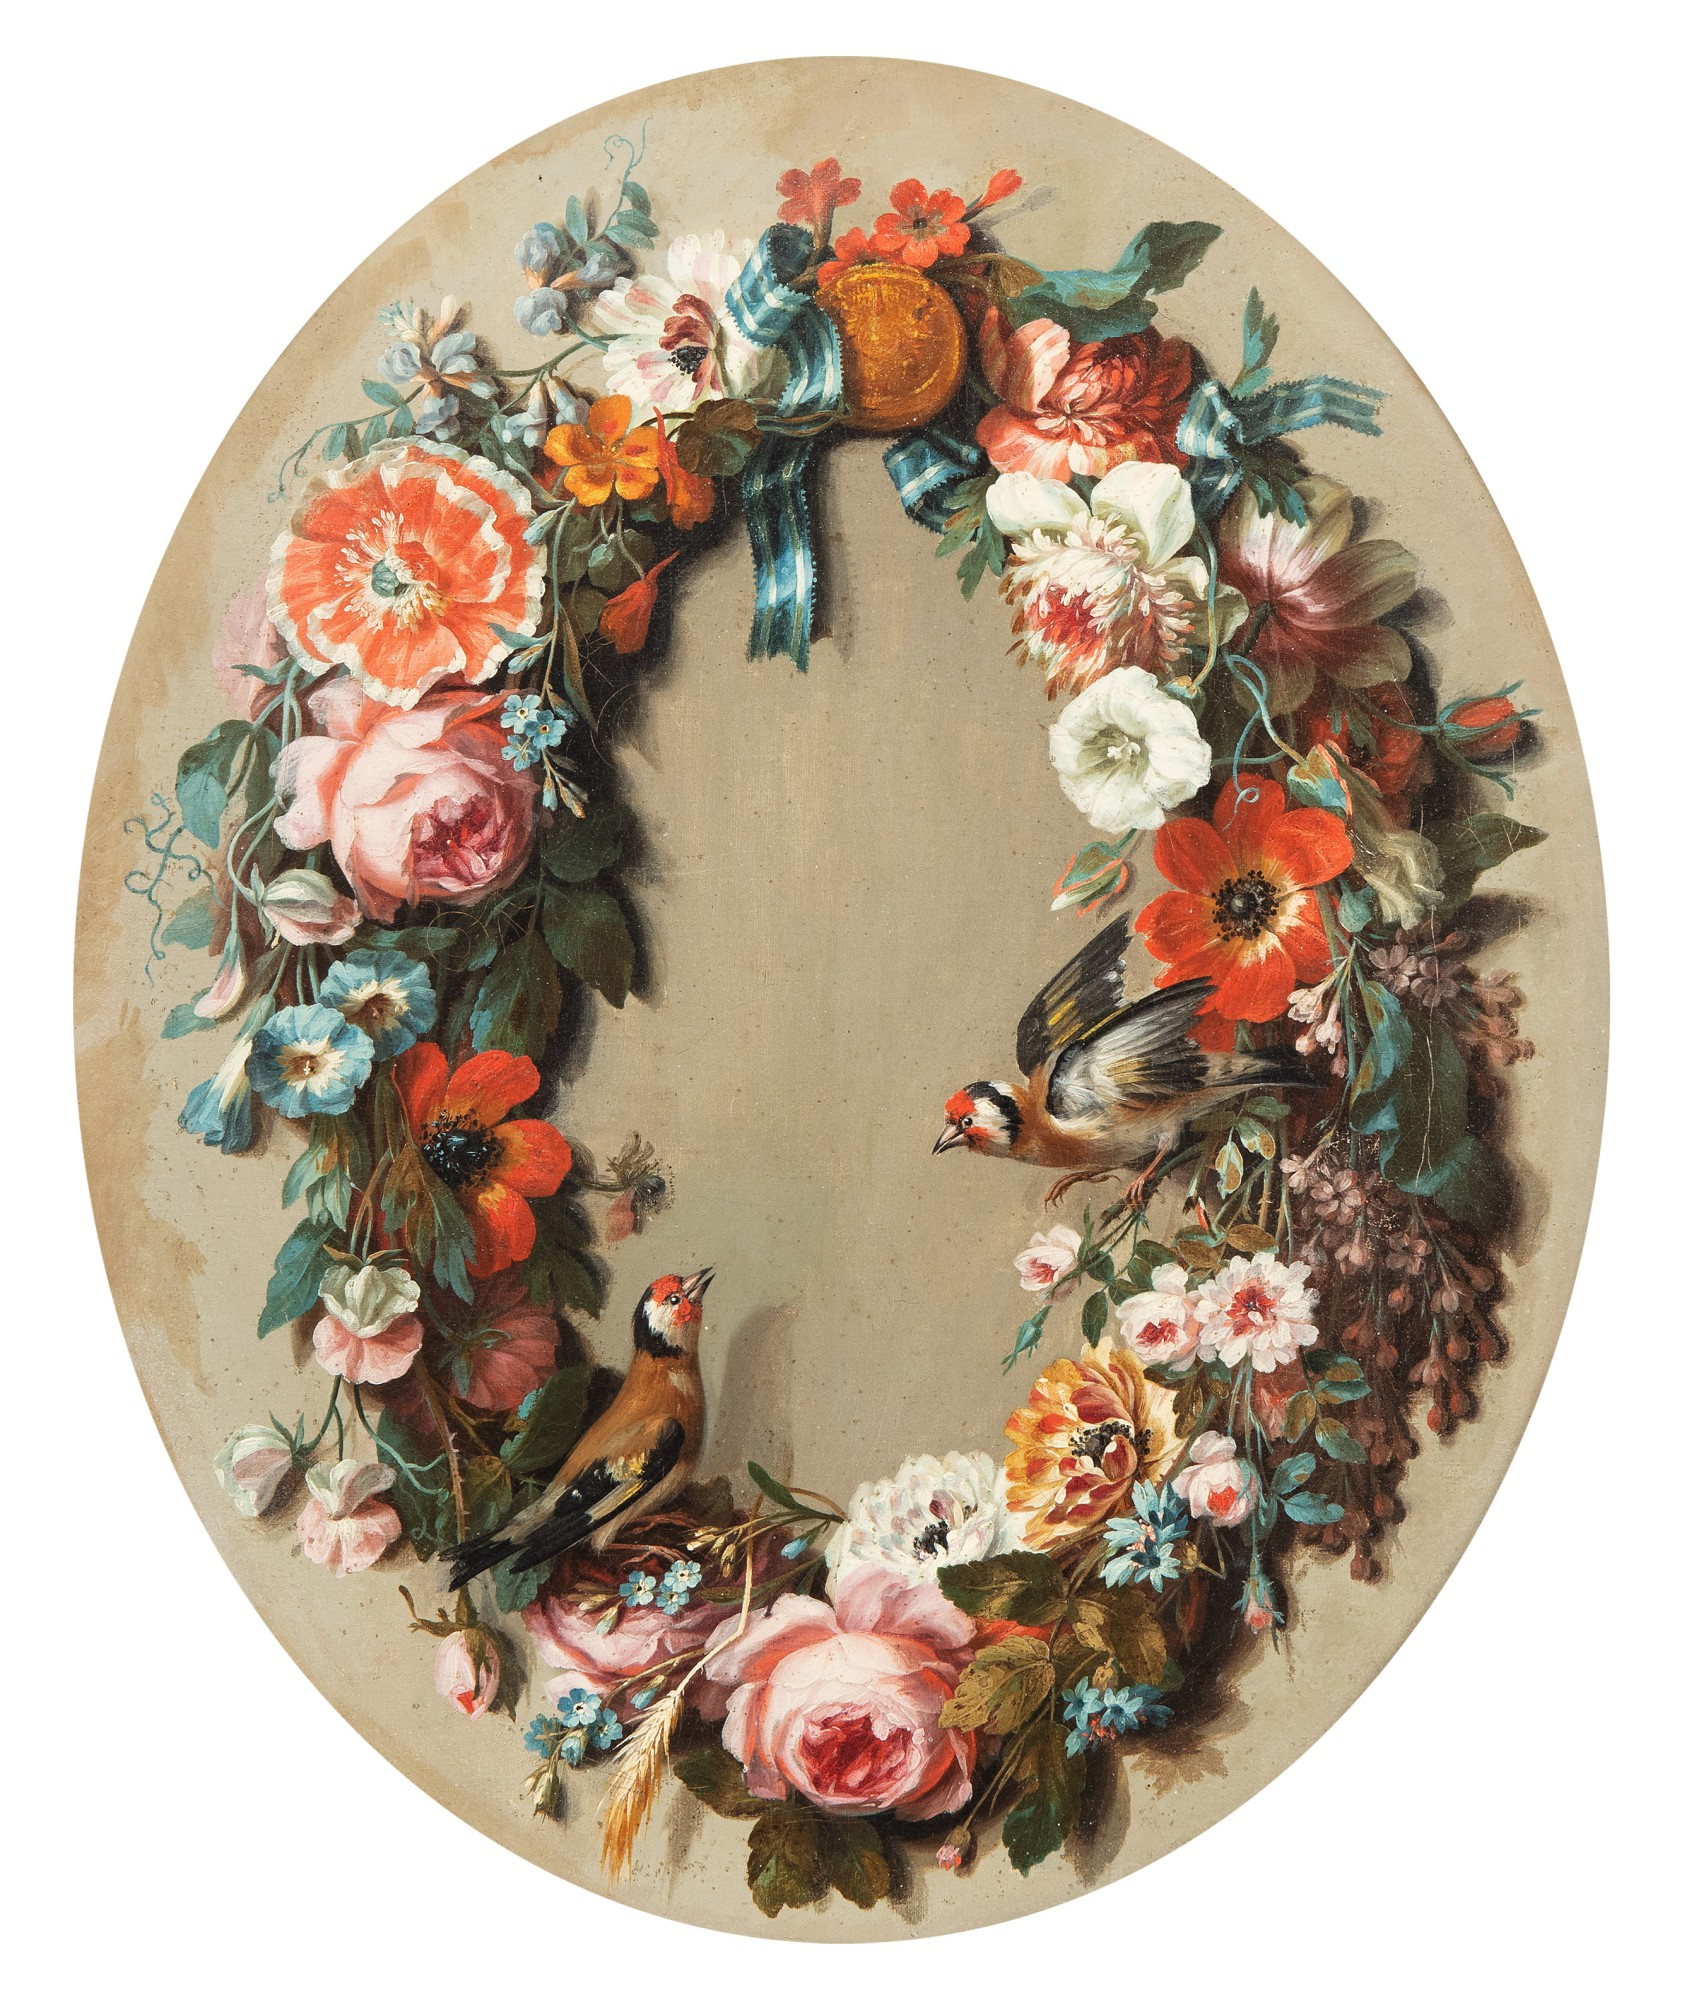 JEAN BAPTISTE BELIN DE FONTENAY   FLOWER GARLAND WITH A PAIR OF GOLDFINCH [GUIRLANDE DE FLEURS AUX CHARDONNERETS]